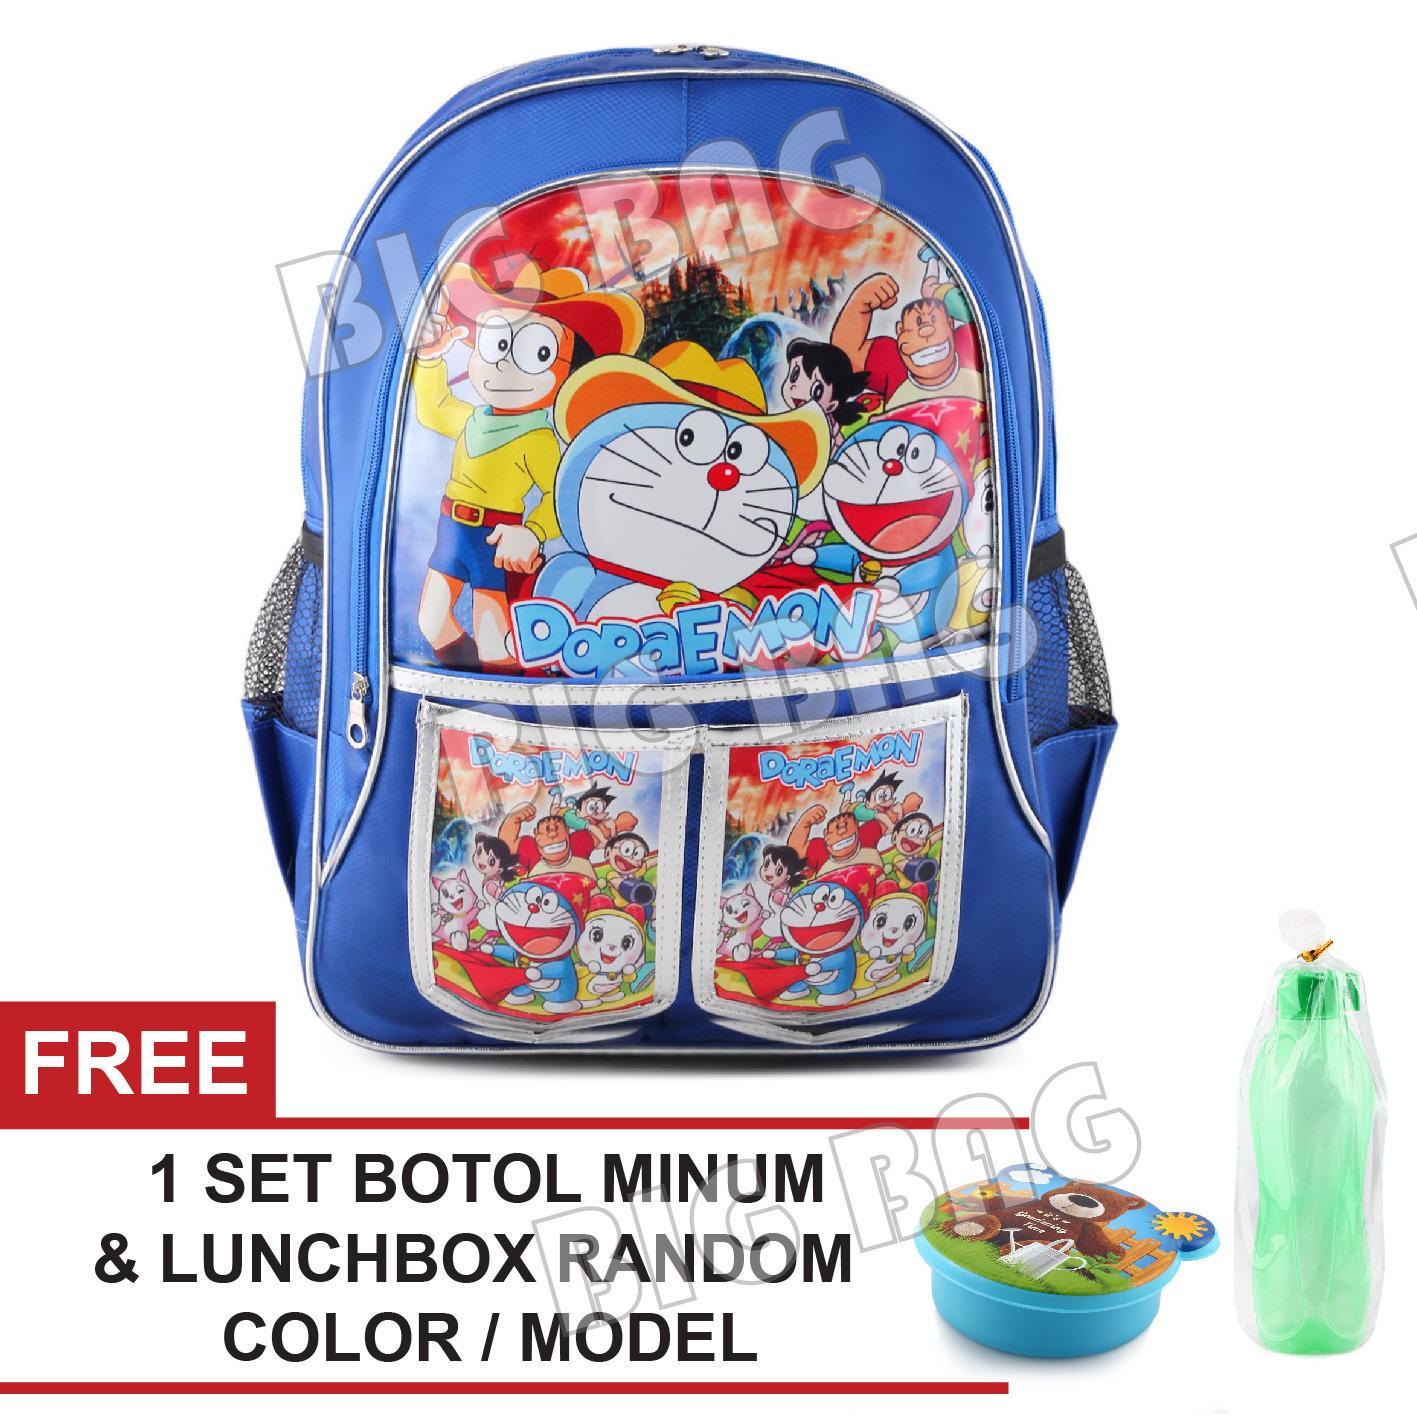 Tas Ransel Anak - Doraemon - Adventure Series - Catch Up - Underworld School Bag Tas Sekolah Anak + FREE Botol Minum Antarthic - BLUE + Lunchbox & Botol Random Color / Model Tas Anak Tas Sekolah Tas Anak Karakter